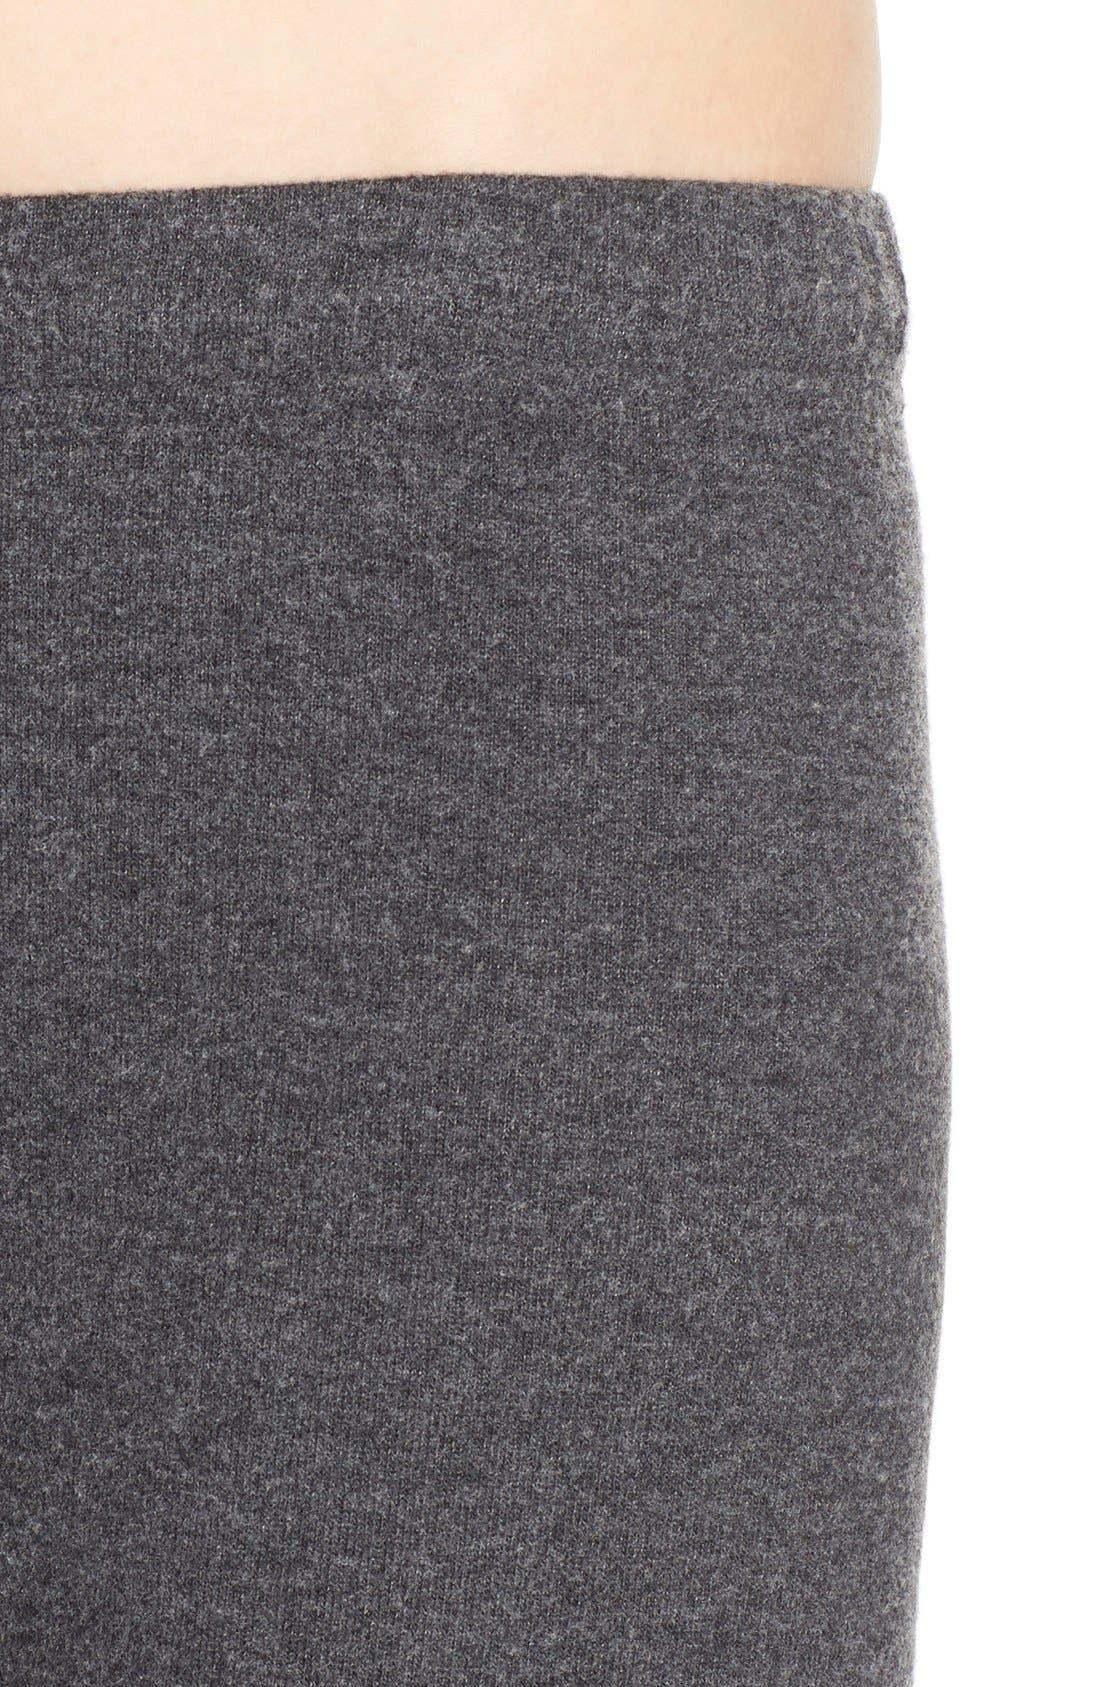 'Nate' Crop Sweatpants,                             Alternate thumbnail 2, color,                             001